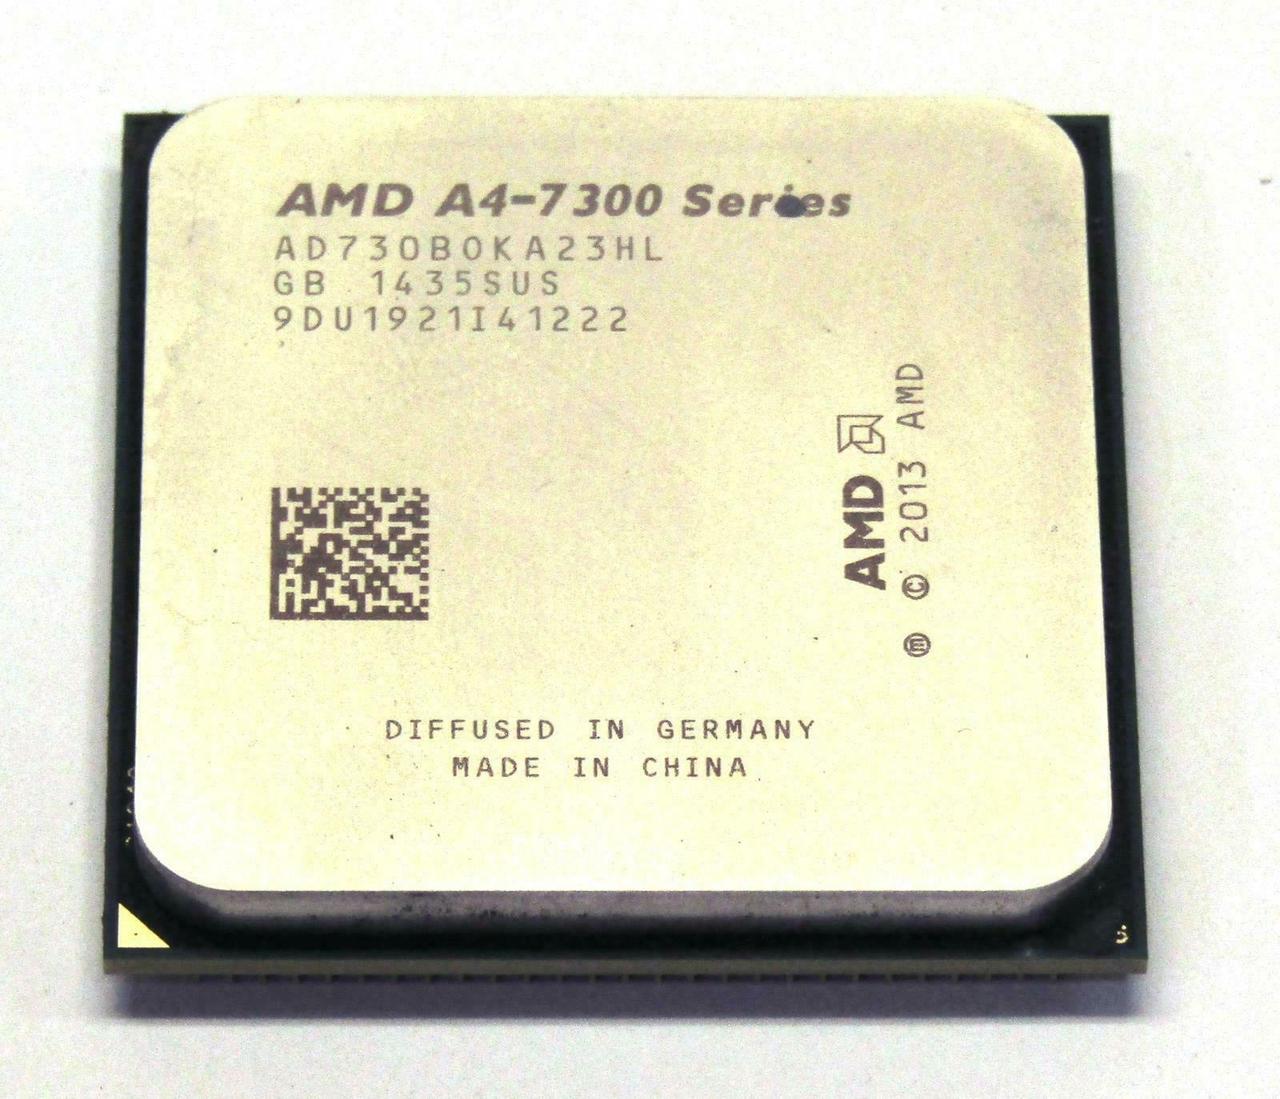 Процессор AMD A4-7300 Series 4,0-3,8GHz Socket FM2